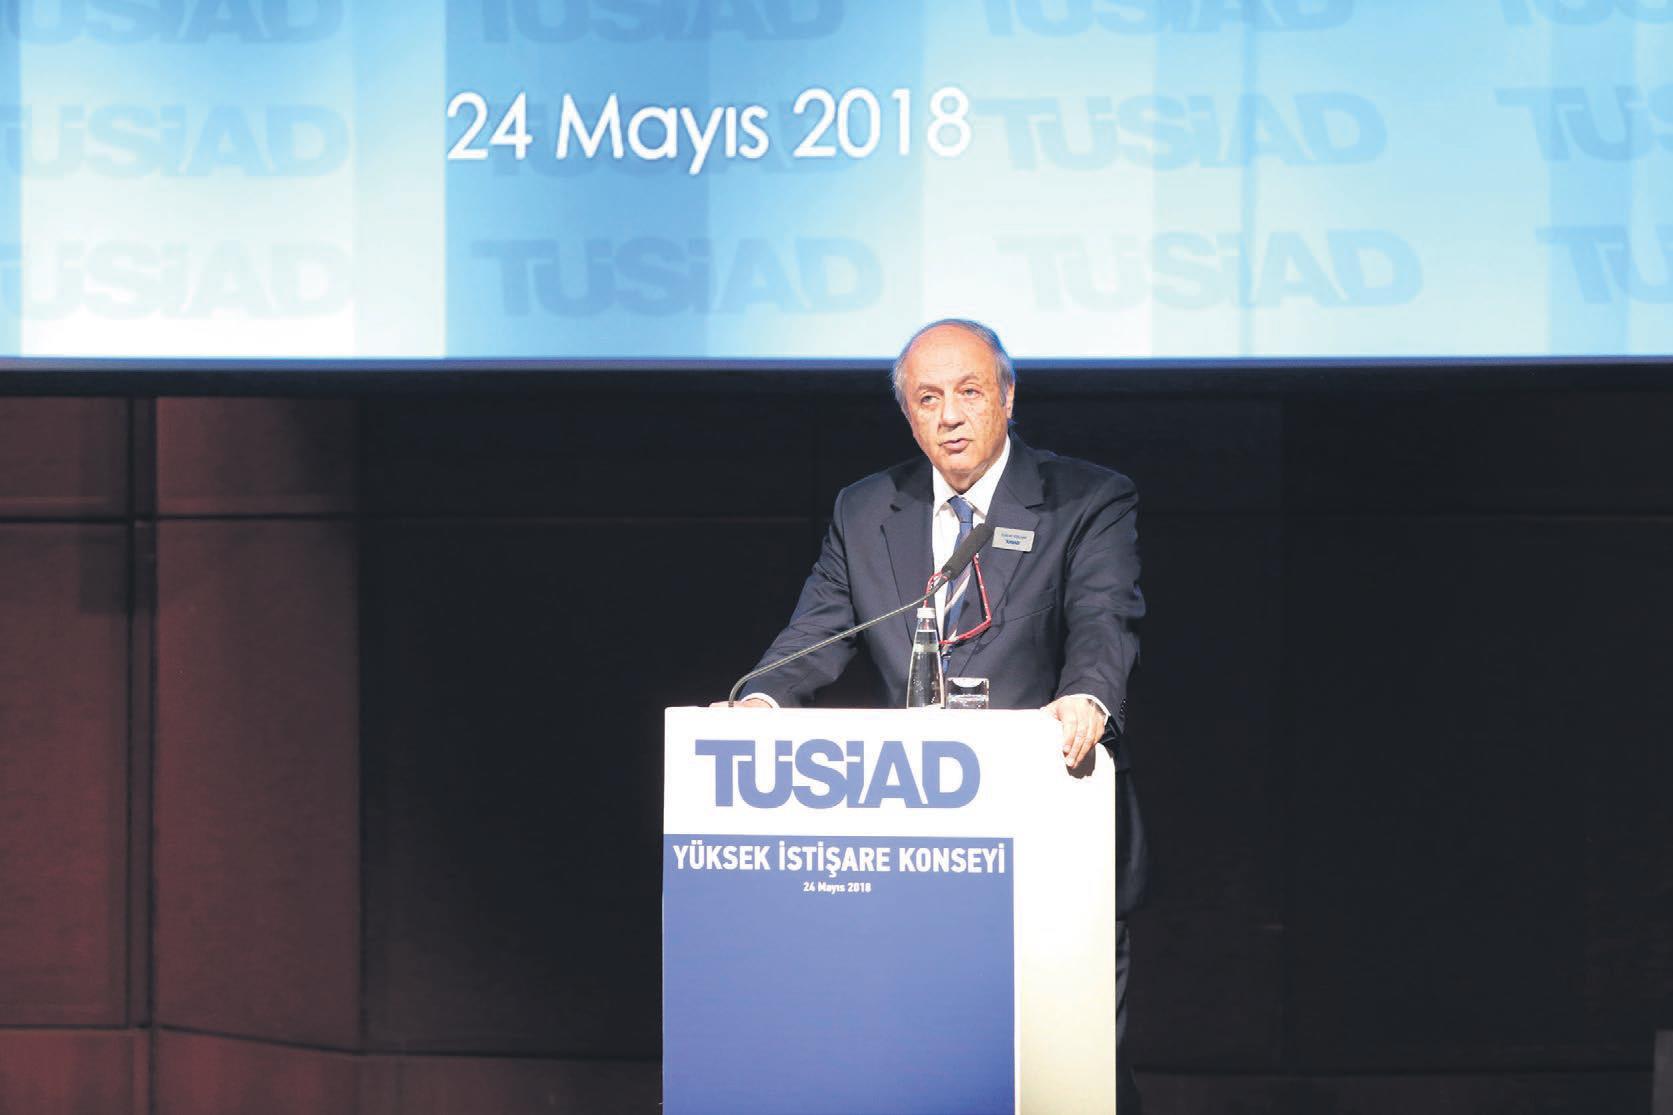 TÜSİAD'dan reform vurgusu